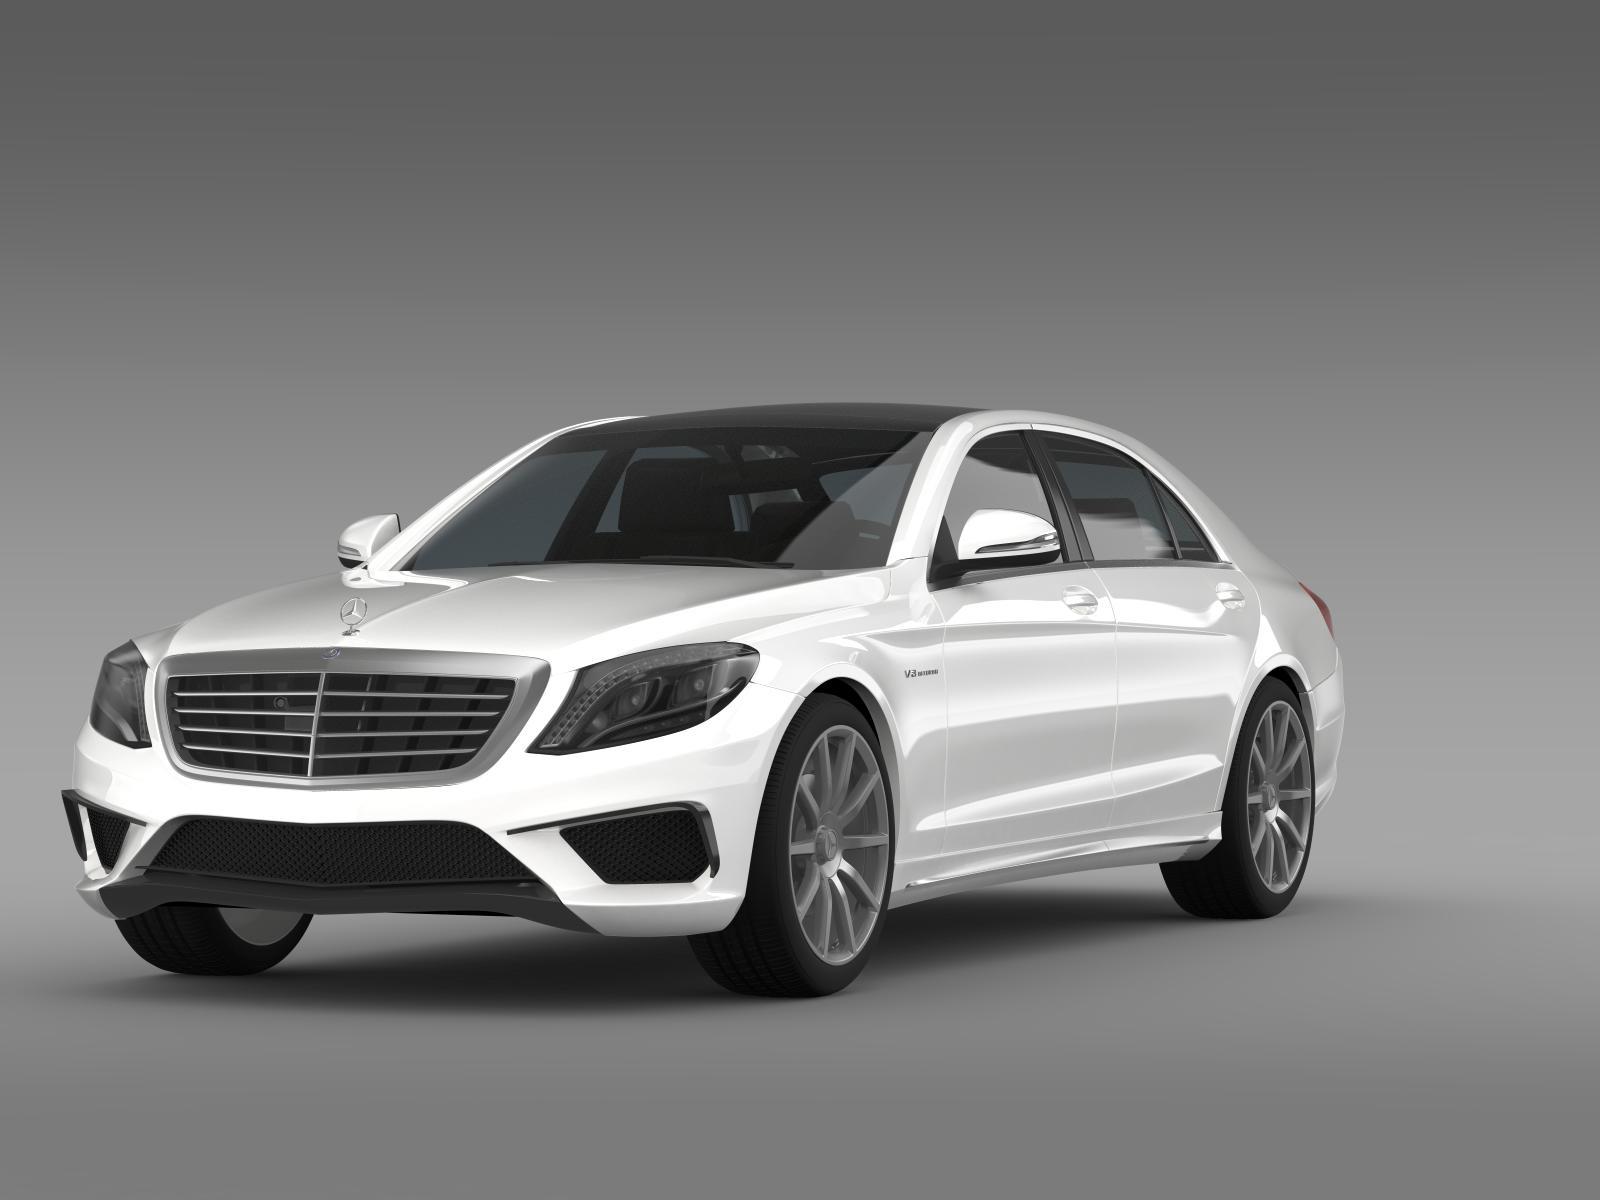 Mercedes benz s 63 amg w222 2013 3d model buy mercedes for Buy a mercedes benz